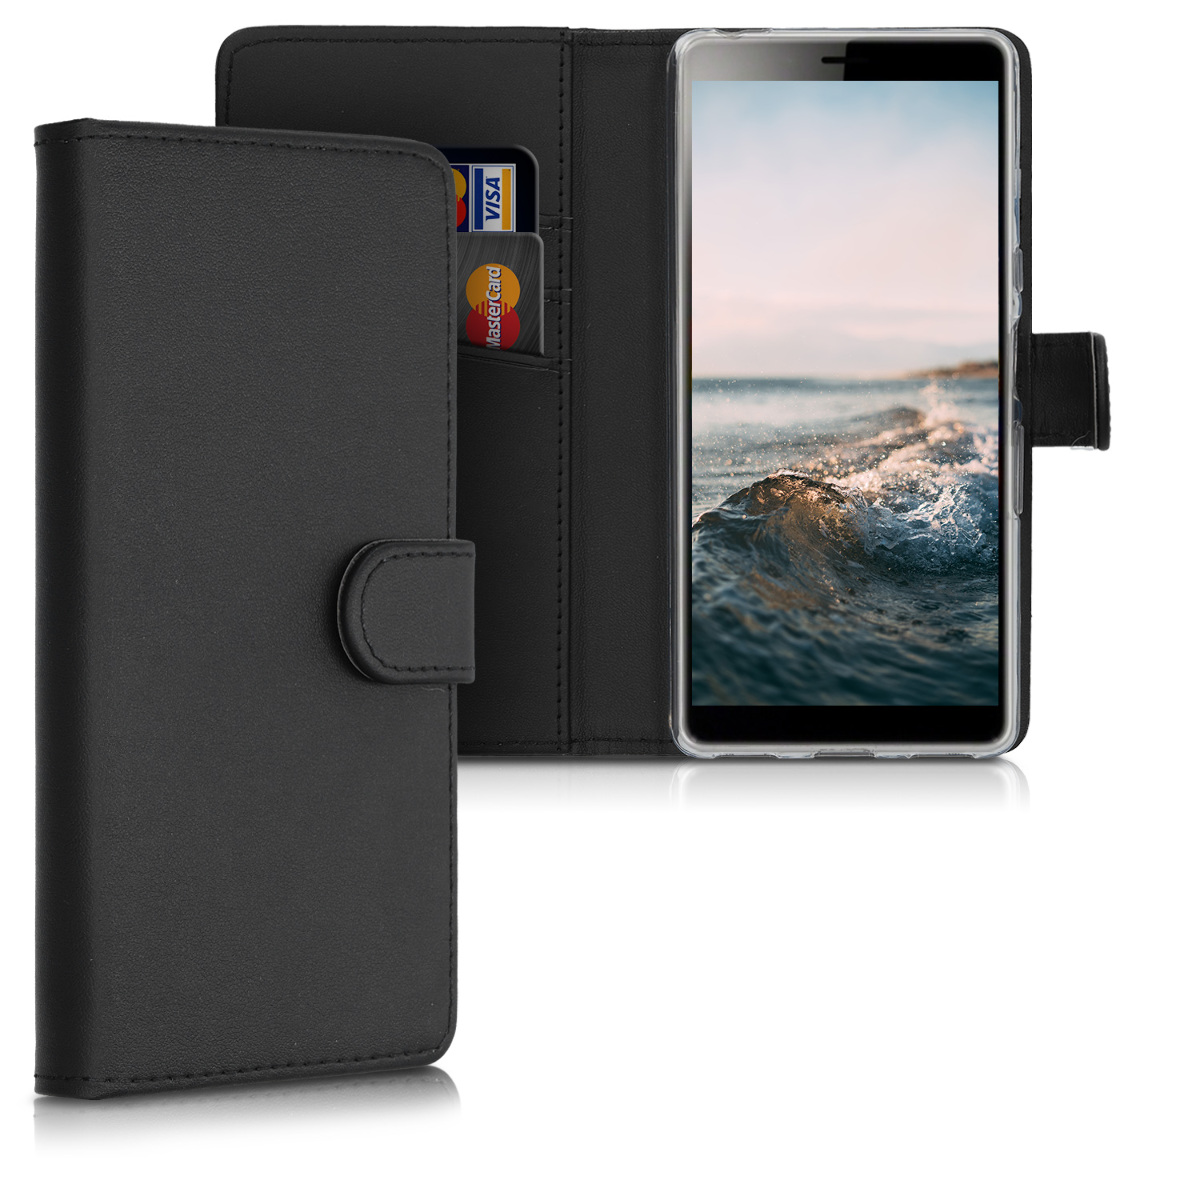 KW Θήκη Πορτοφόλι Sony Xperia L3 - Black (49893.01)